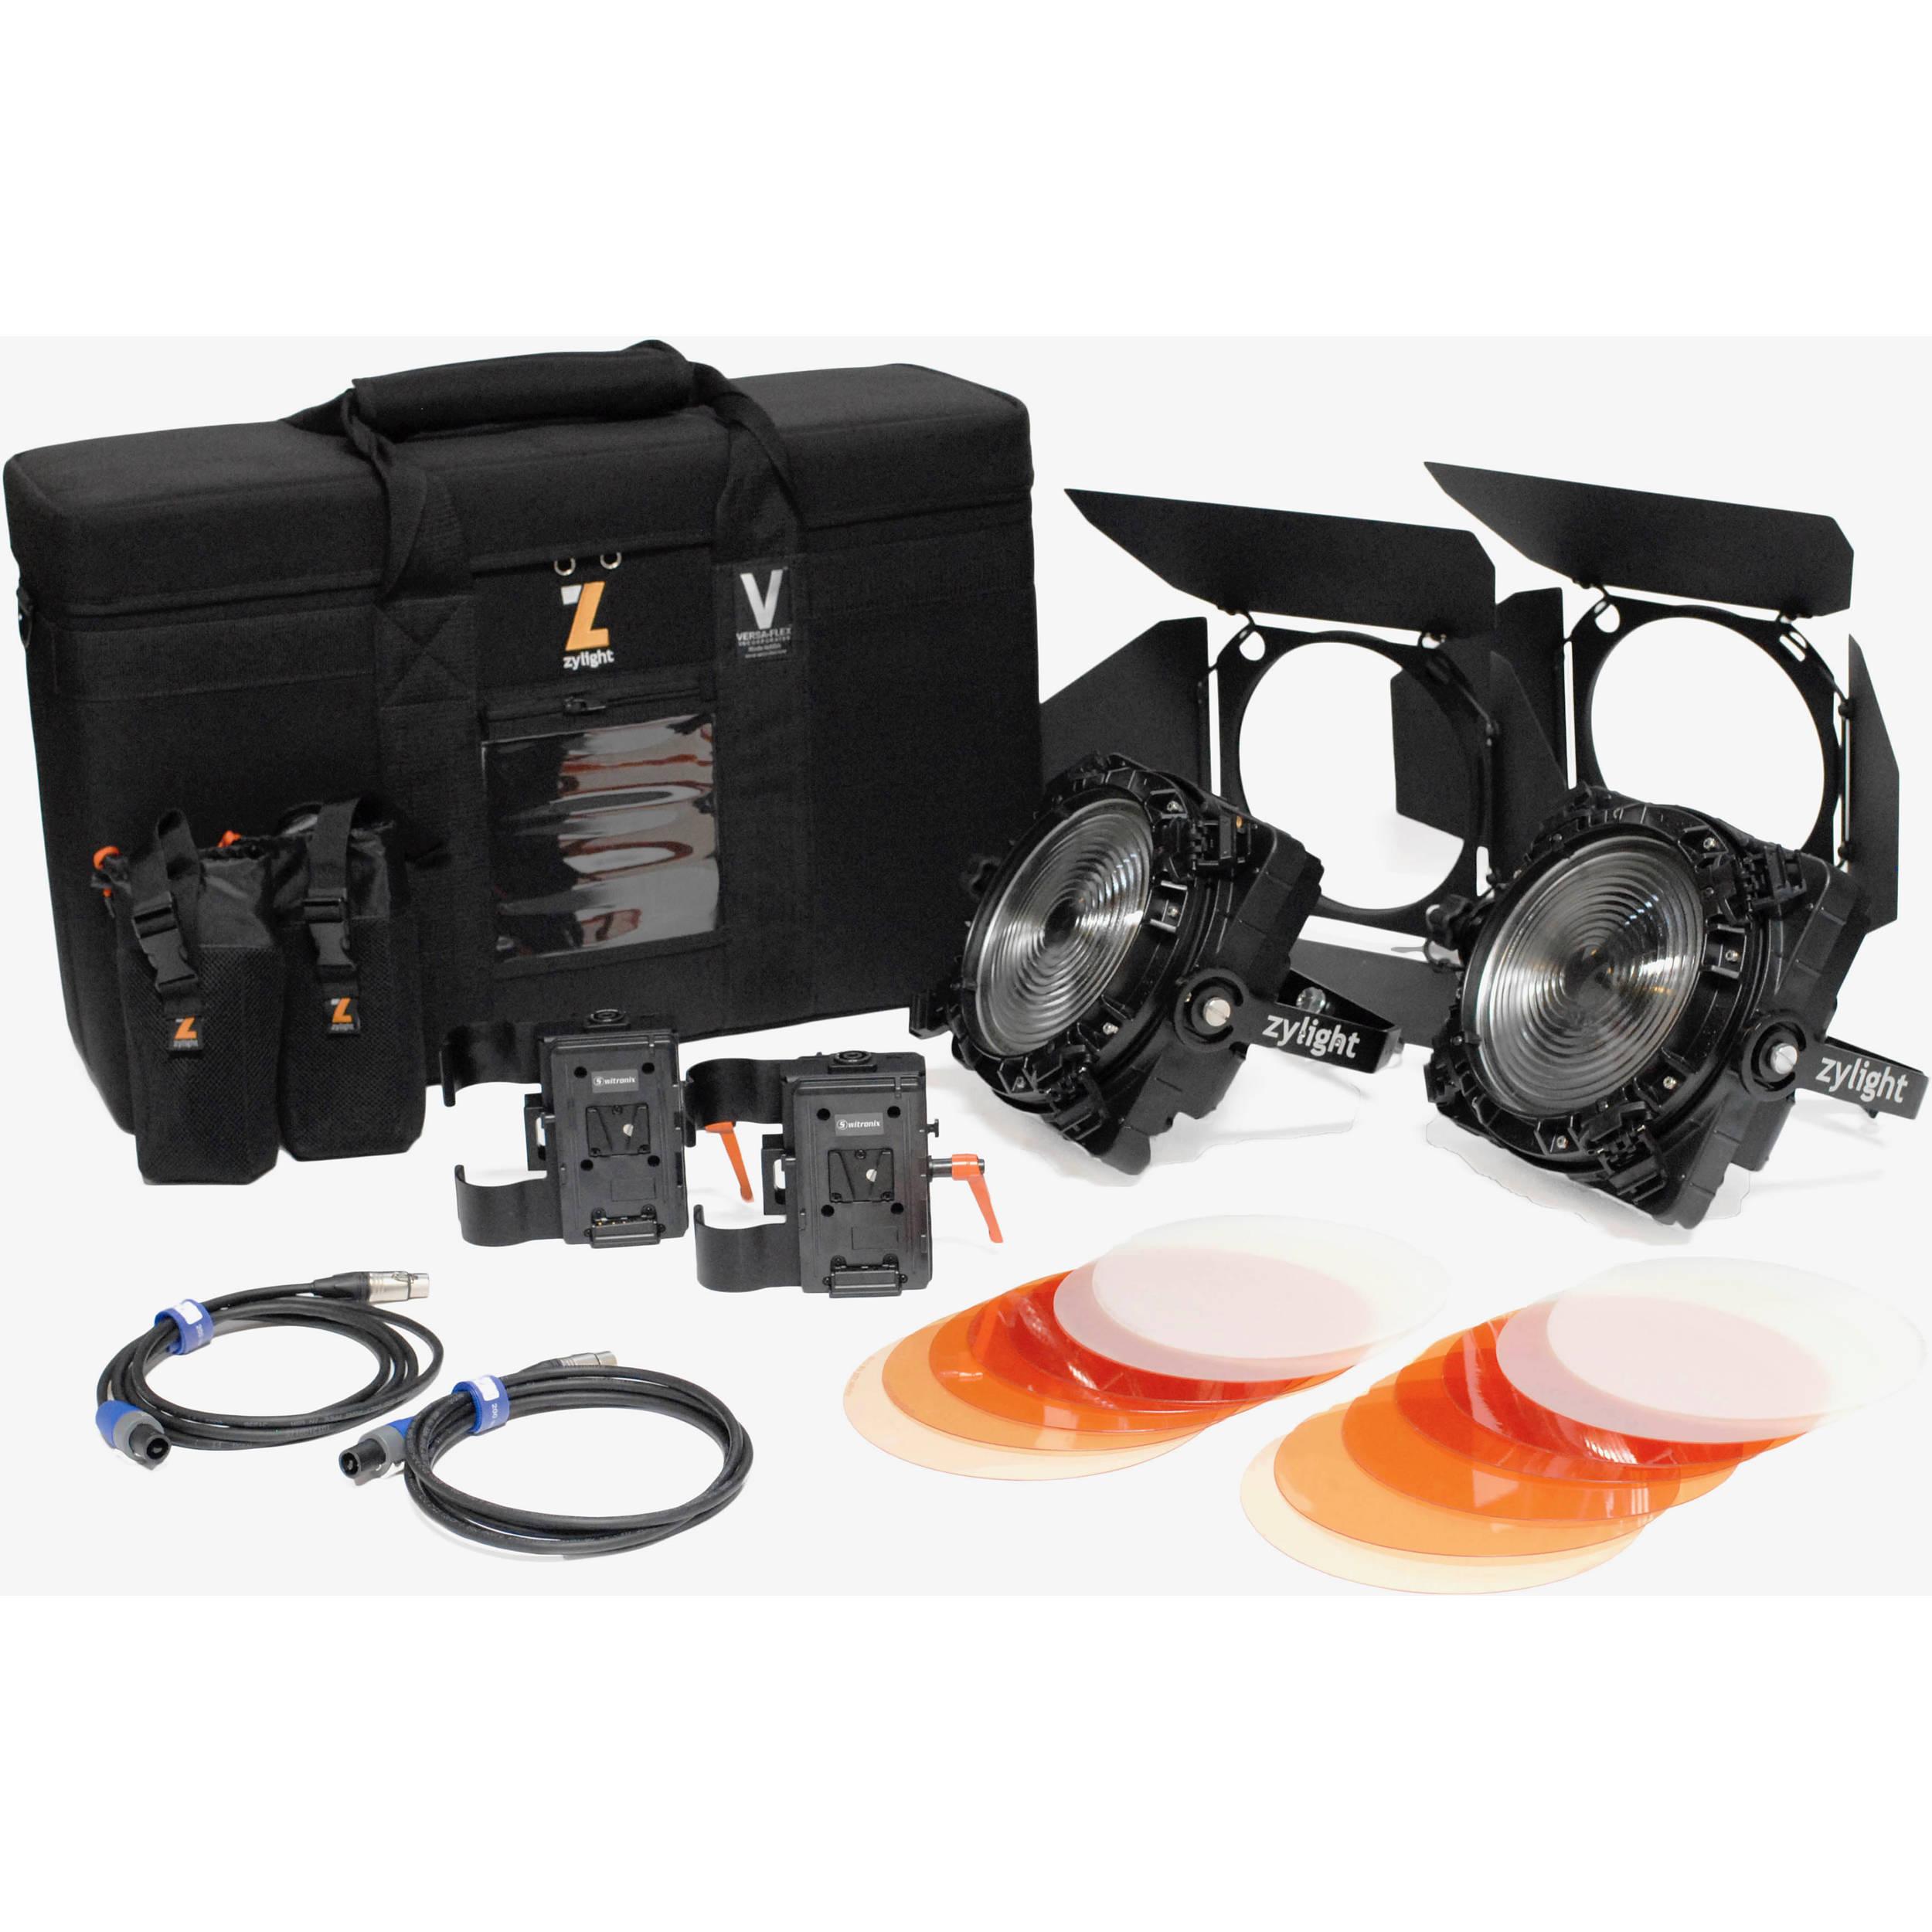 Zylight F8 200 Daylight Led Fresnel Dual Head Eng Kit 26 01054